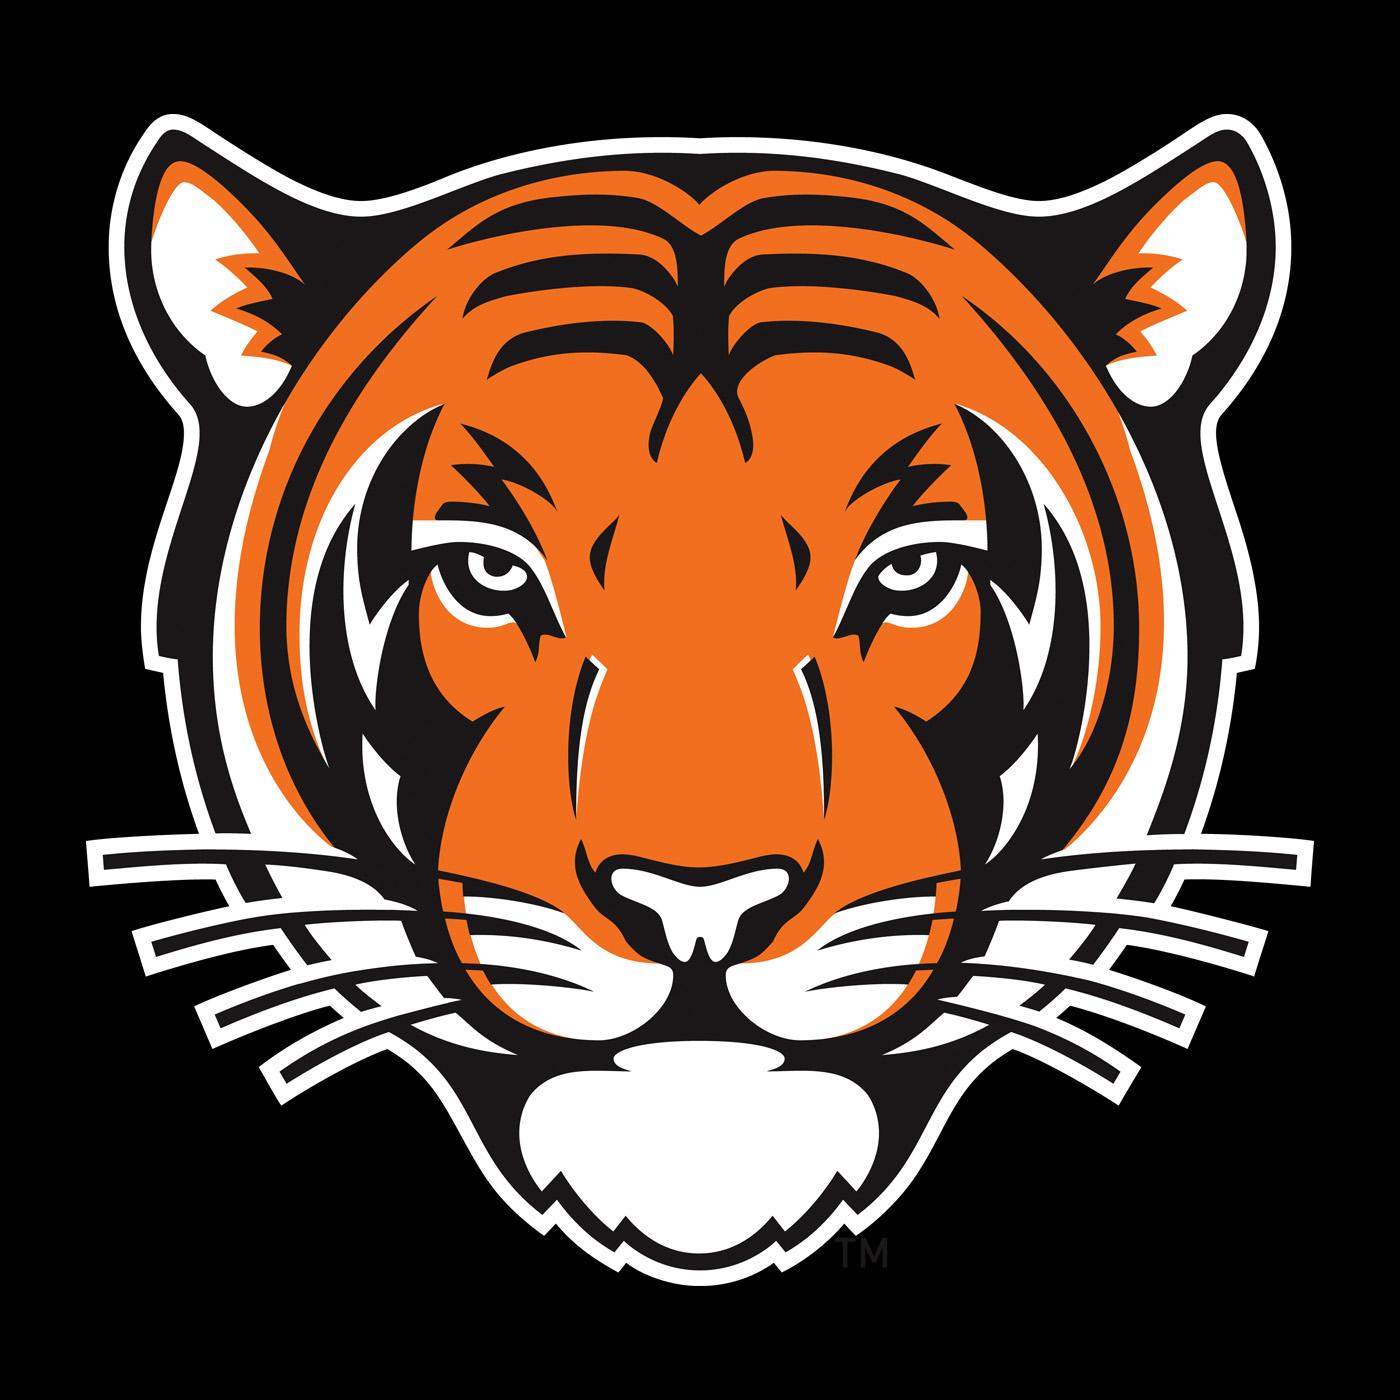 Tiger! Tiger! Kipling short story  Wikipedia